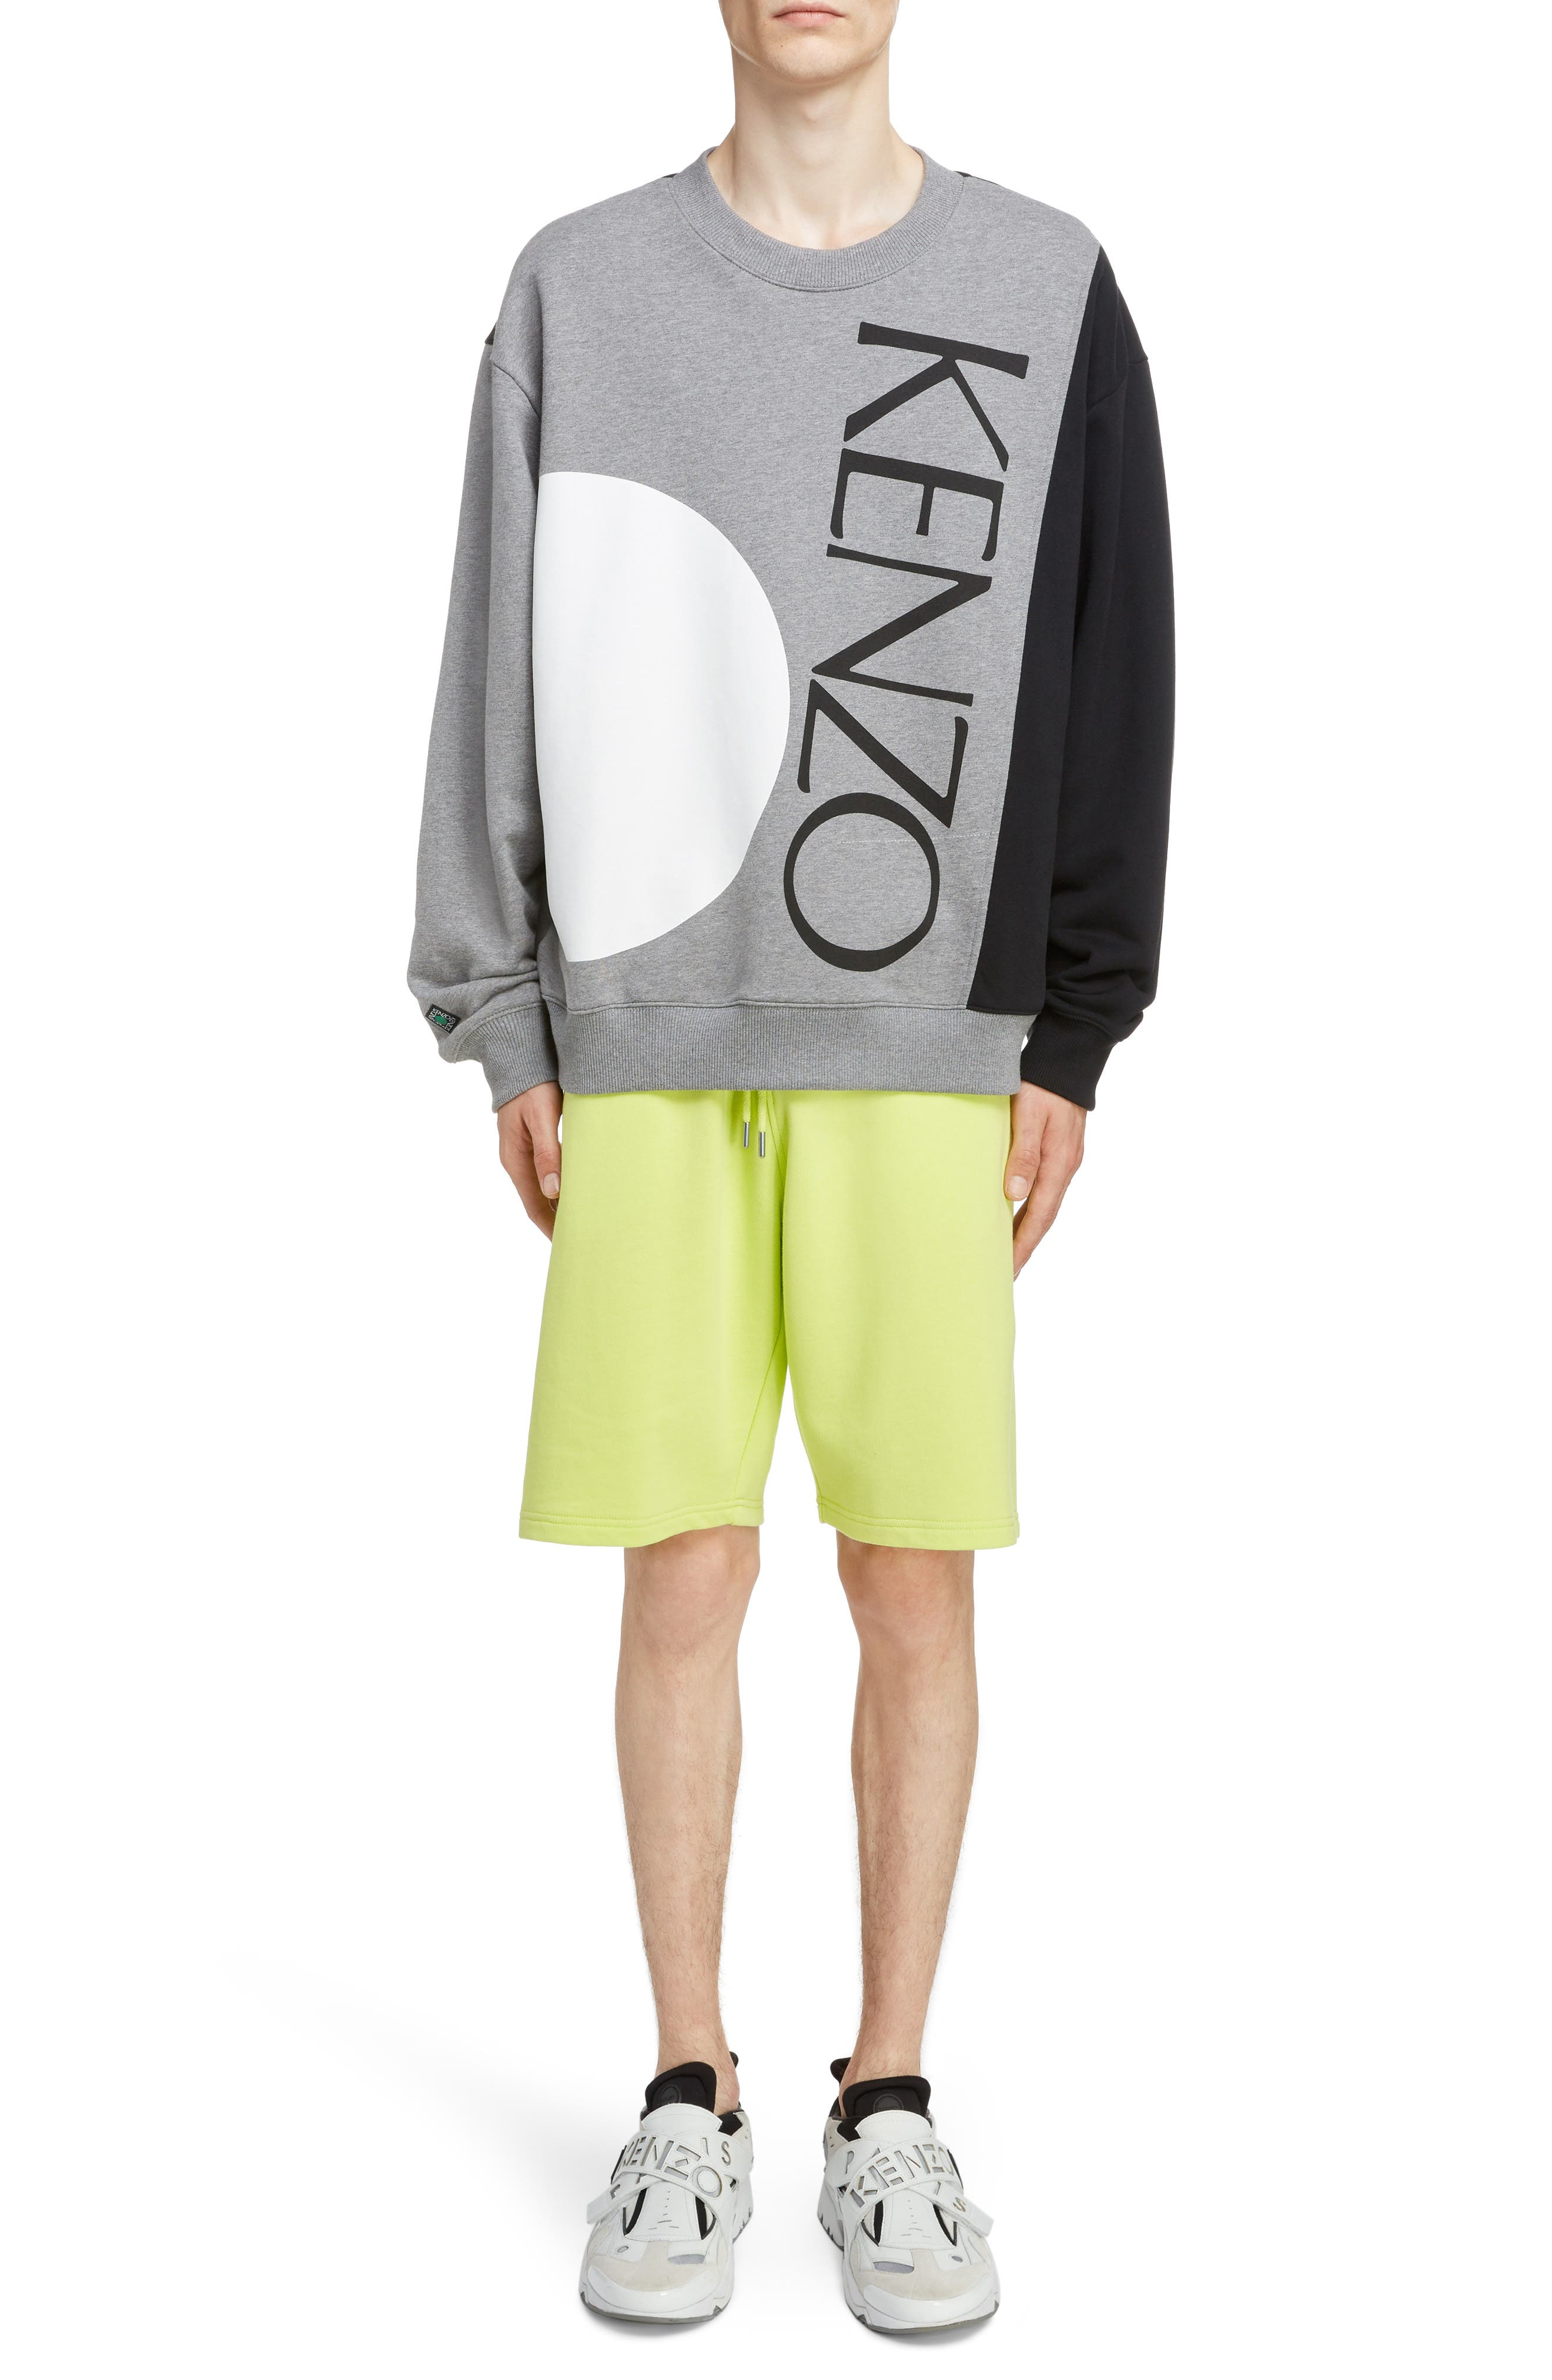 KENZO, Oversize Colorblock Sweatshirt, Alternate thumbnail 7, color, DOVE GREY